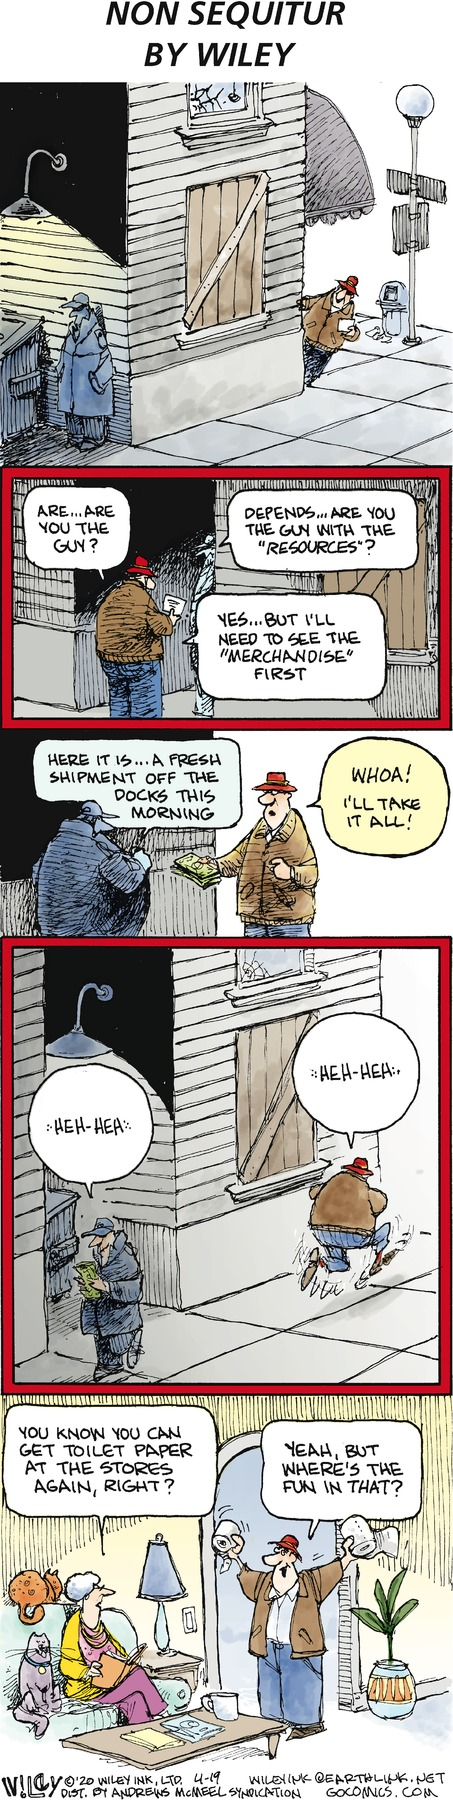 Non Sequitur Comic Strip for April 19, 2020